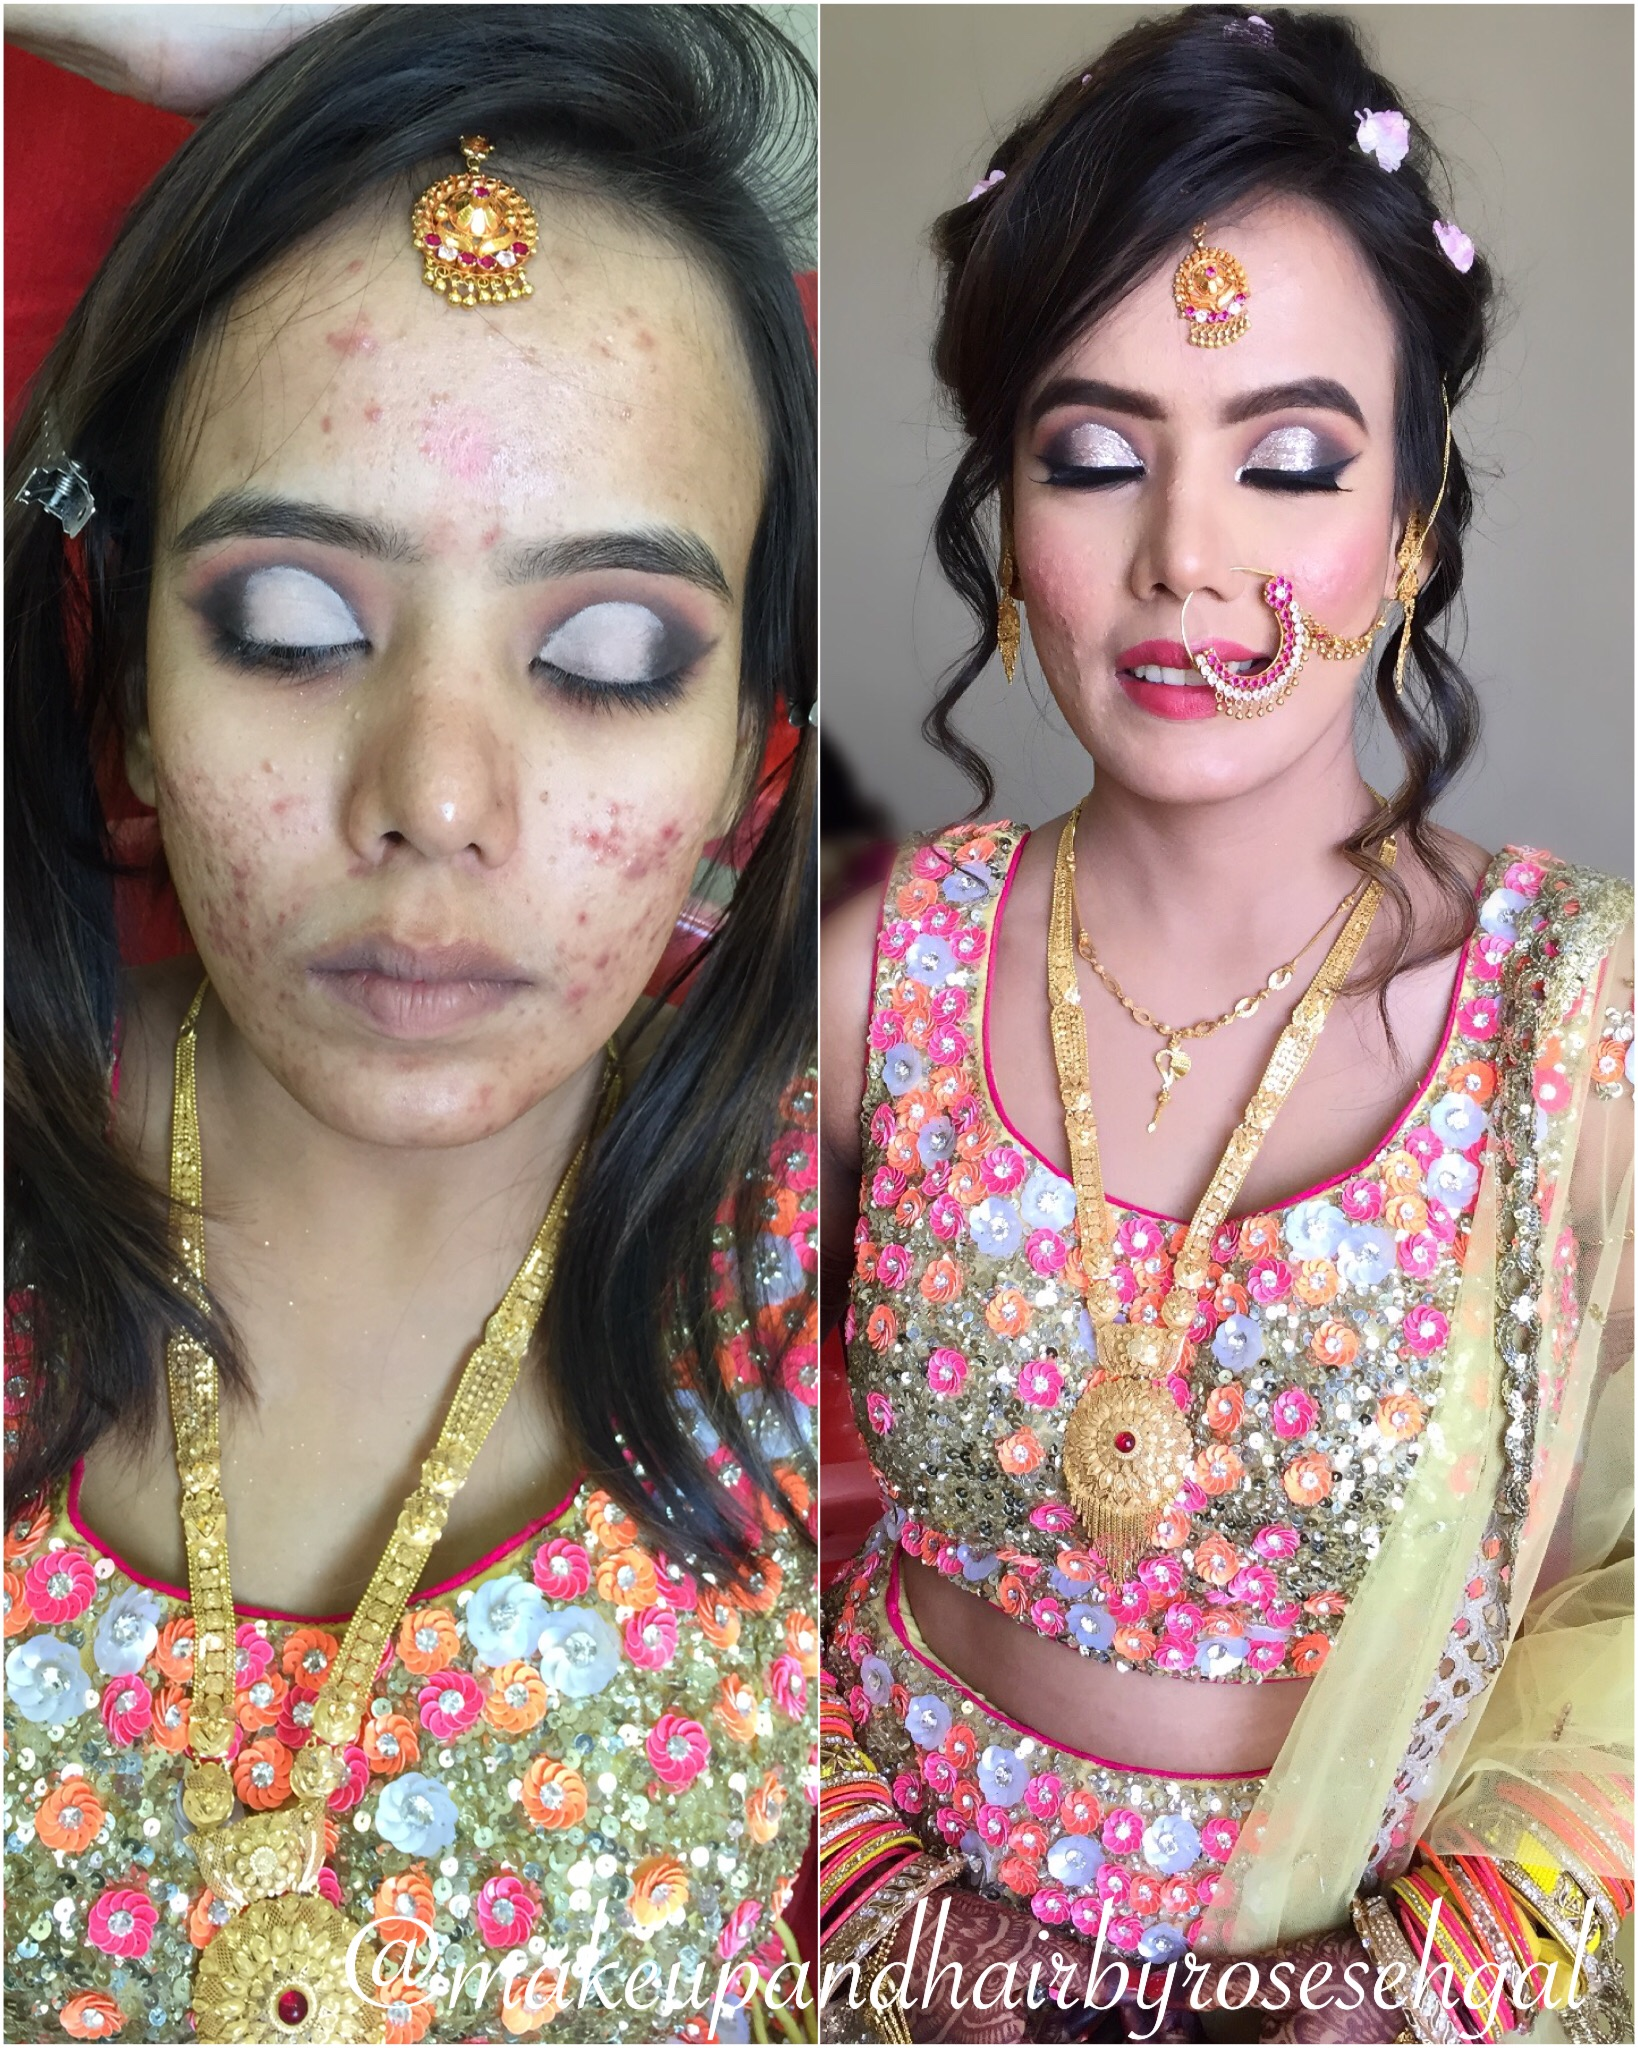 rose-sehgal-makeup-artist-mumbai